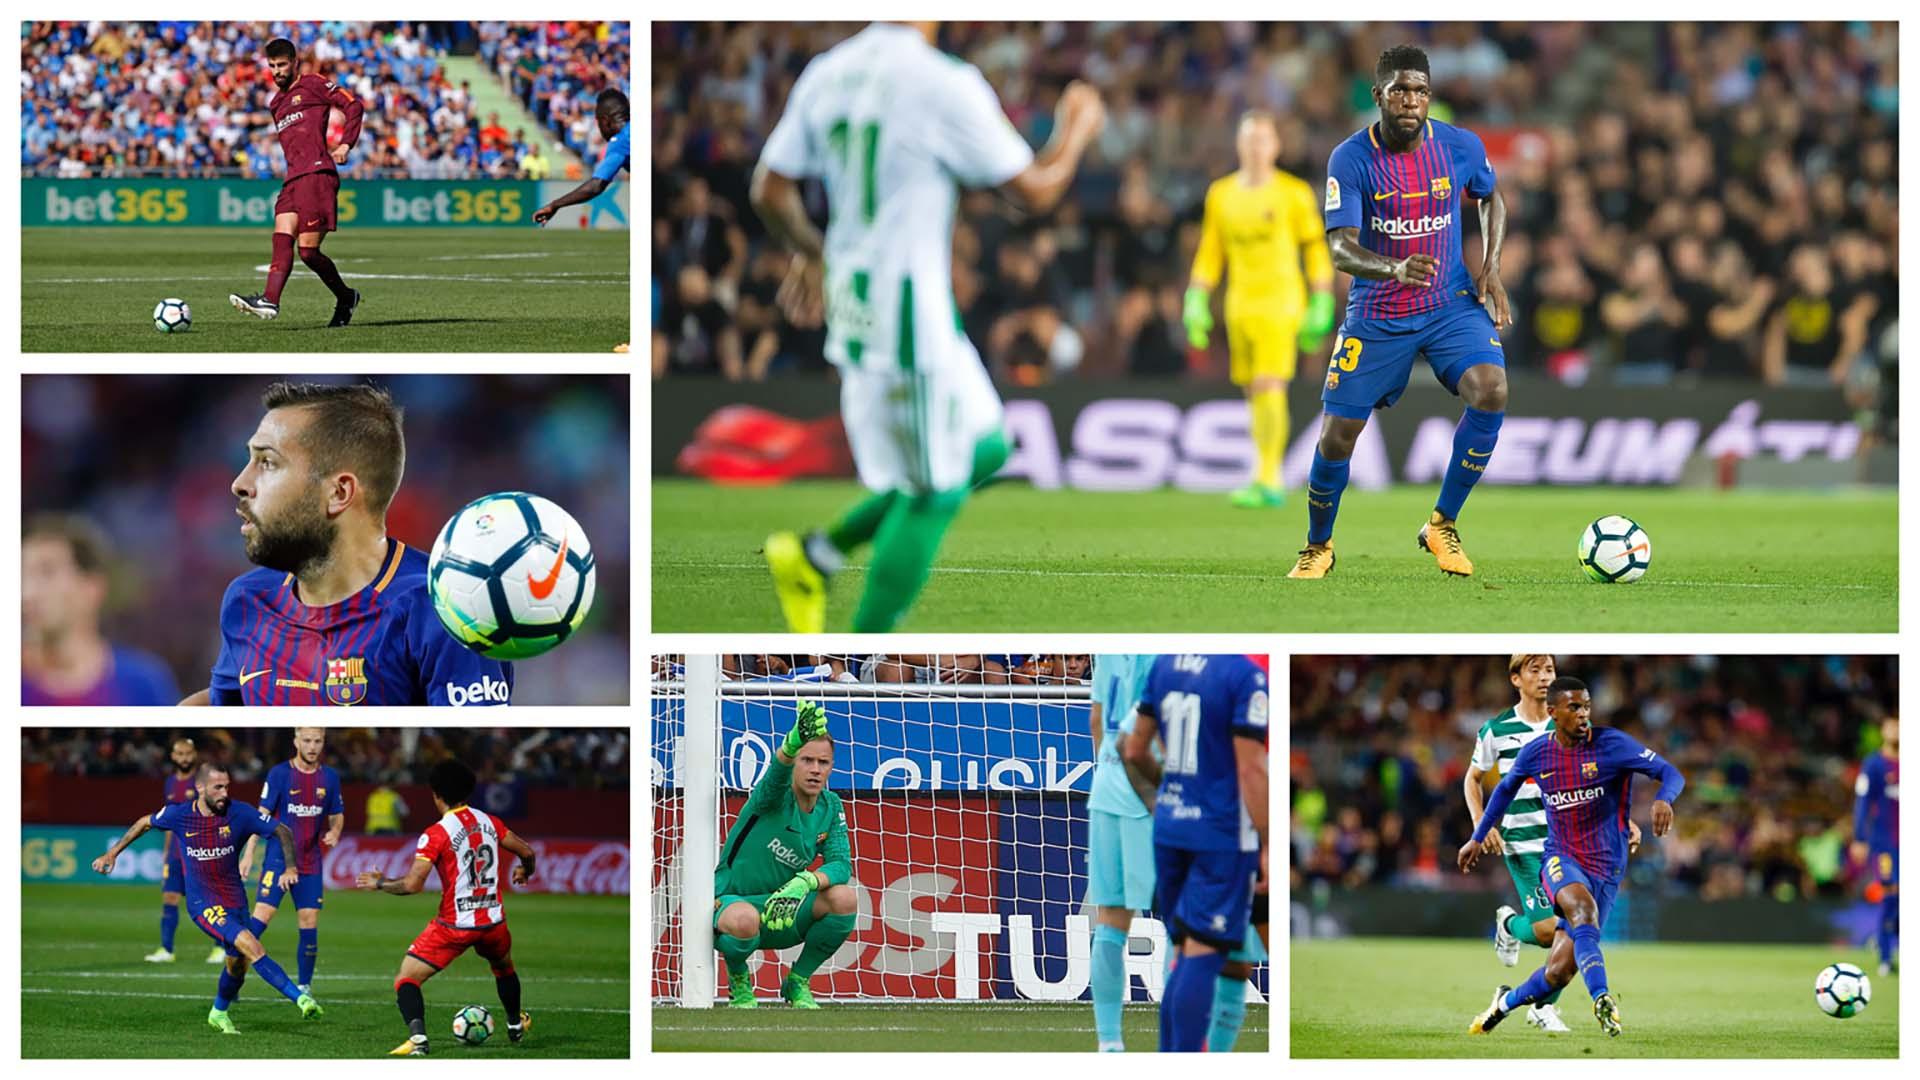 6️⃣ reasons why Barça's defense is dominating this season: https://t.co/Ull18F0idW https://t.co/5qeIzQUp47